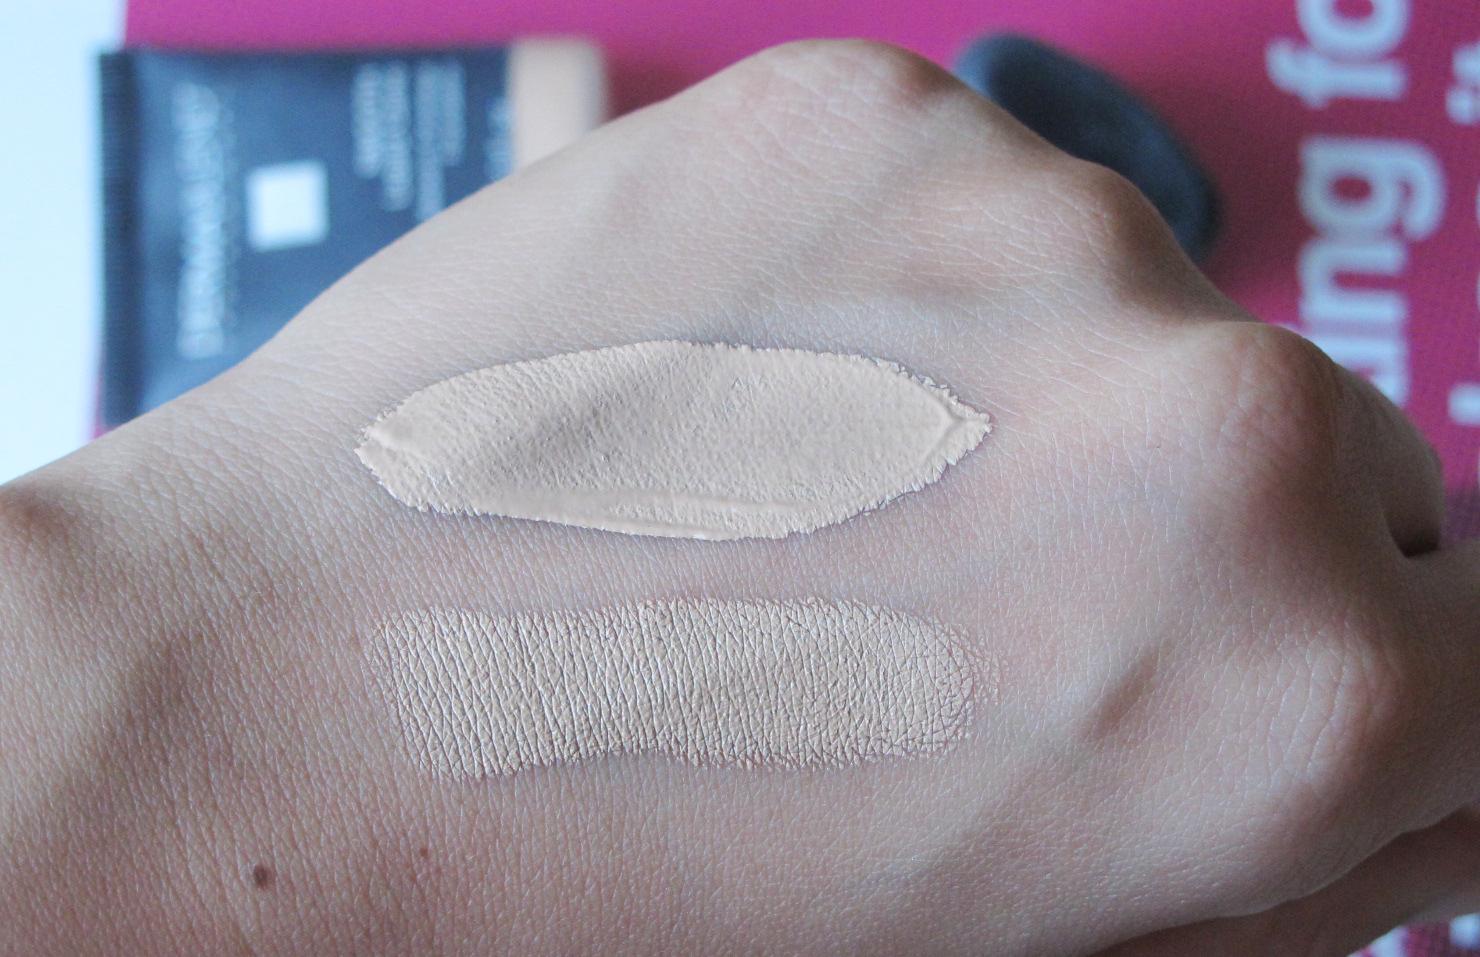 dermablend-brasil-maquiagem-cosmetico-vichy-base-corretivo-resenha-swatch-po-onde-comprar-lancamento